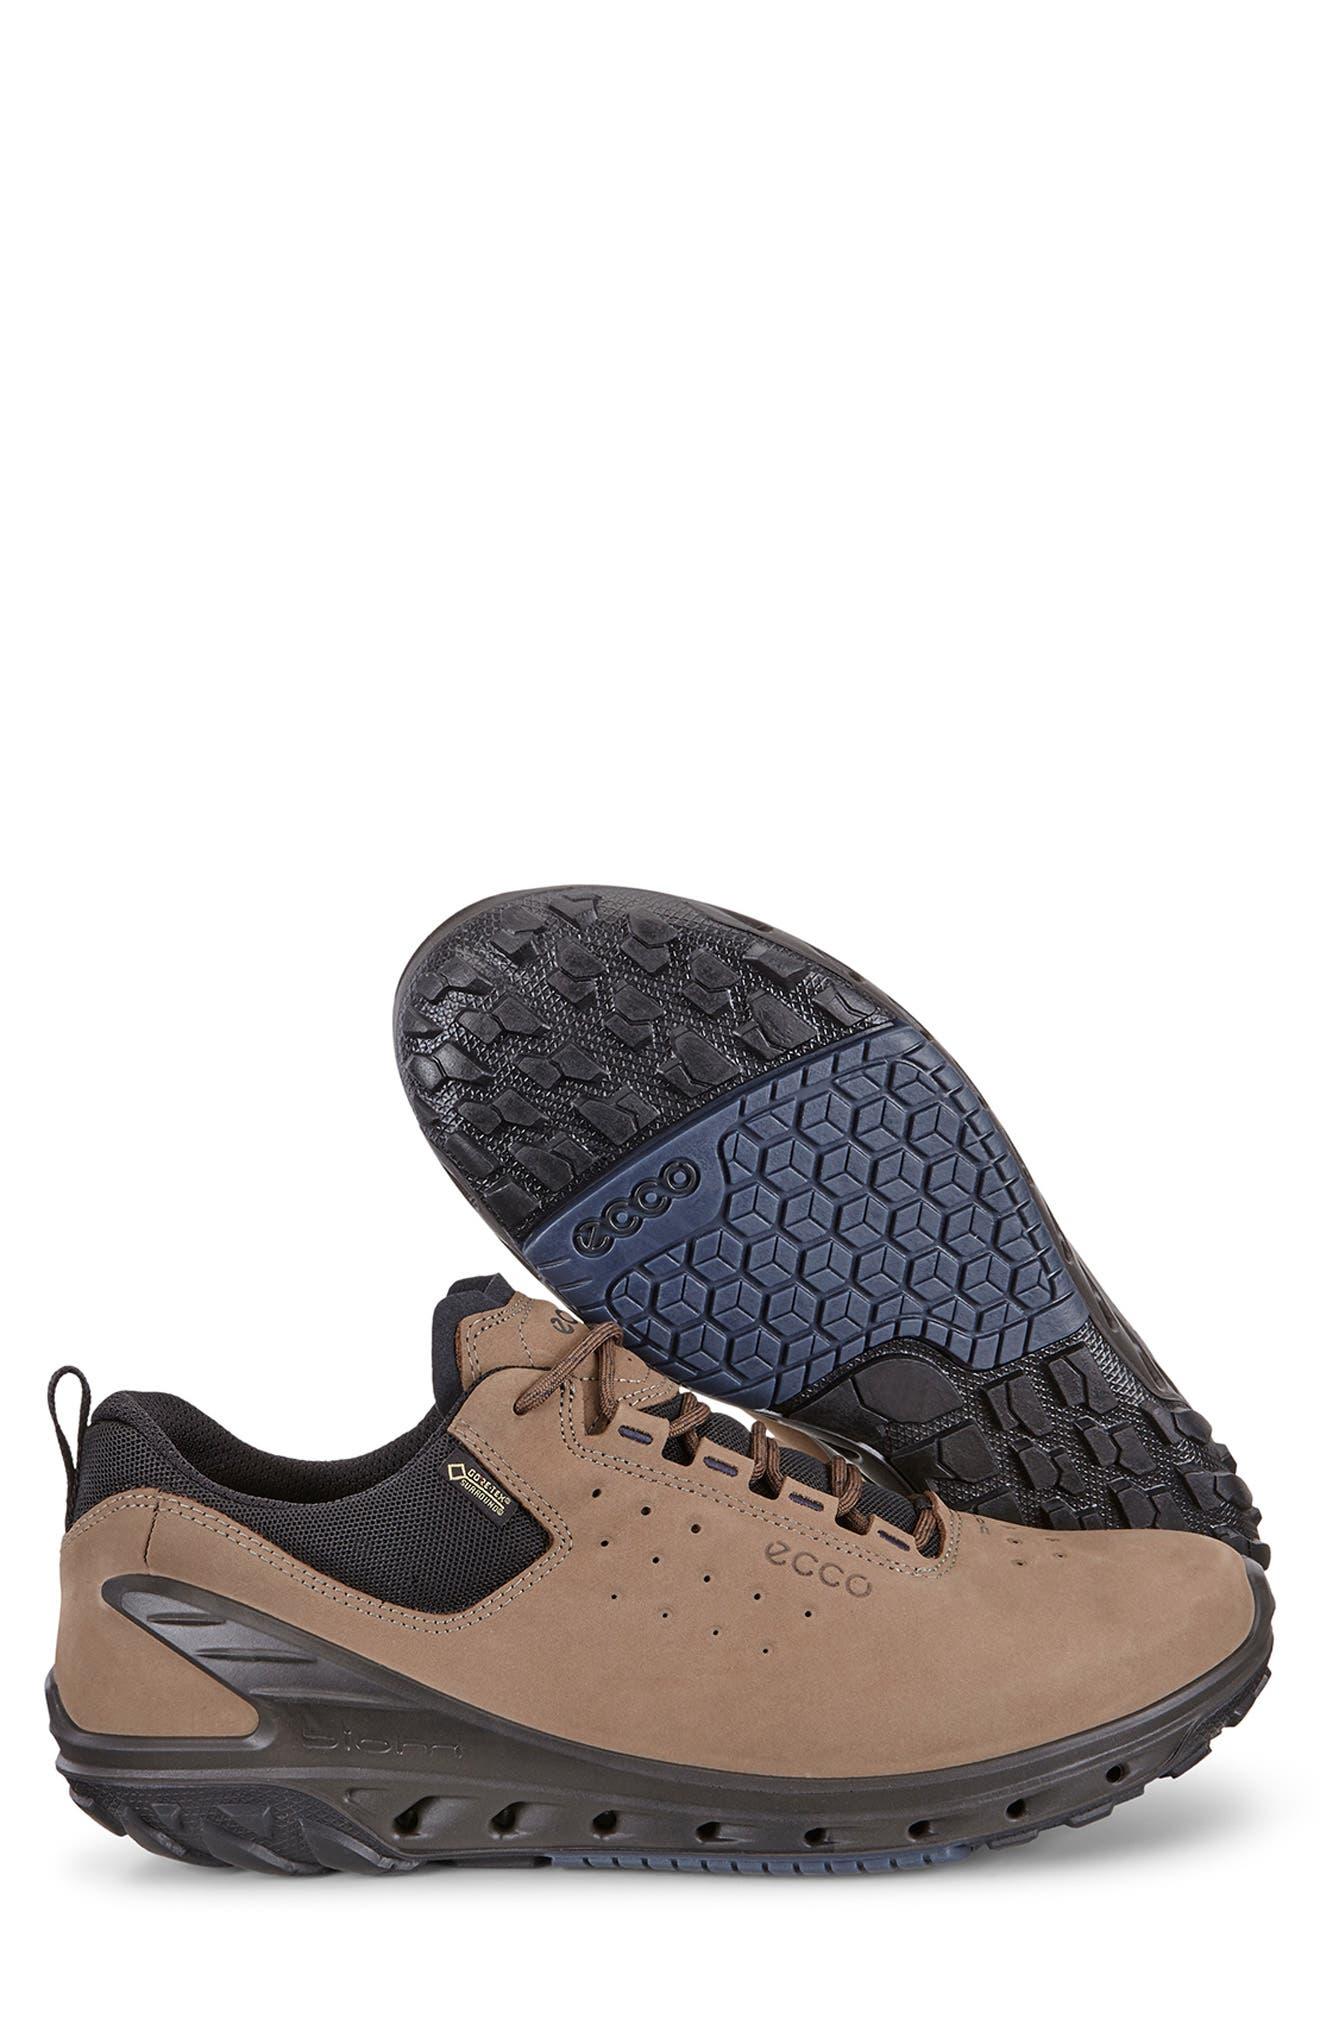 Biom Venture GTX Sneaker,                             Alternate thumbnail 6, color,                             BIRCH BROWN LEATHER